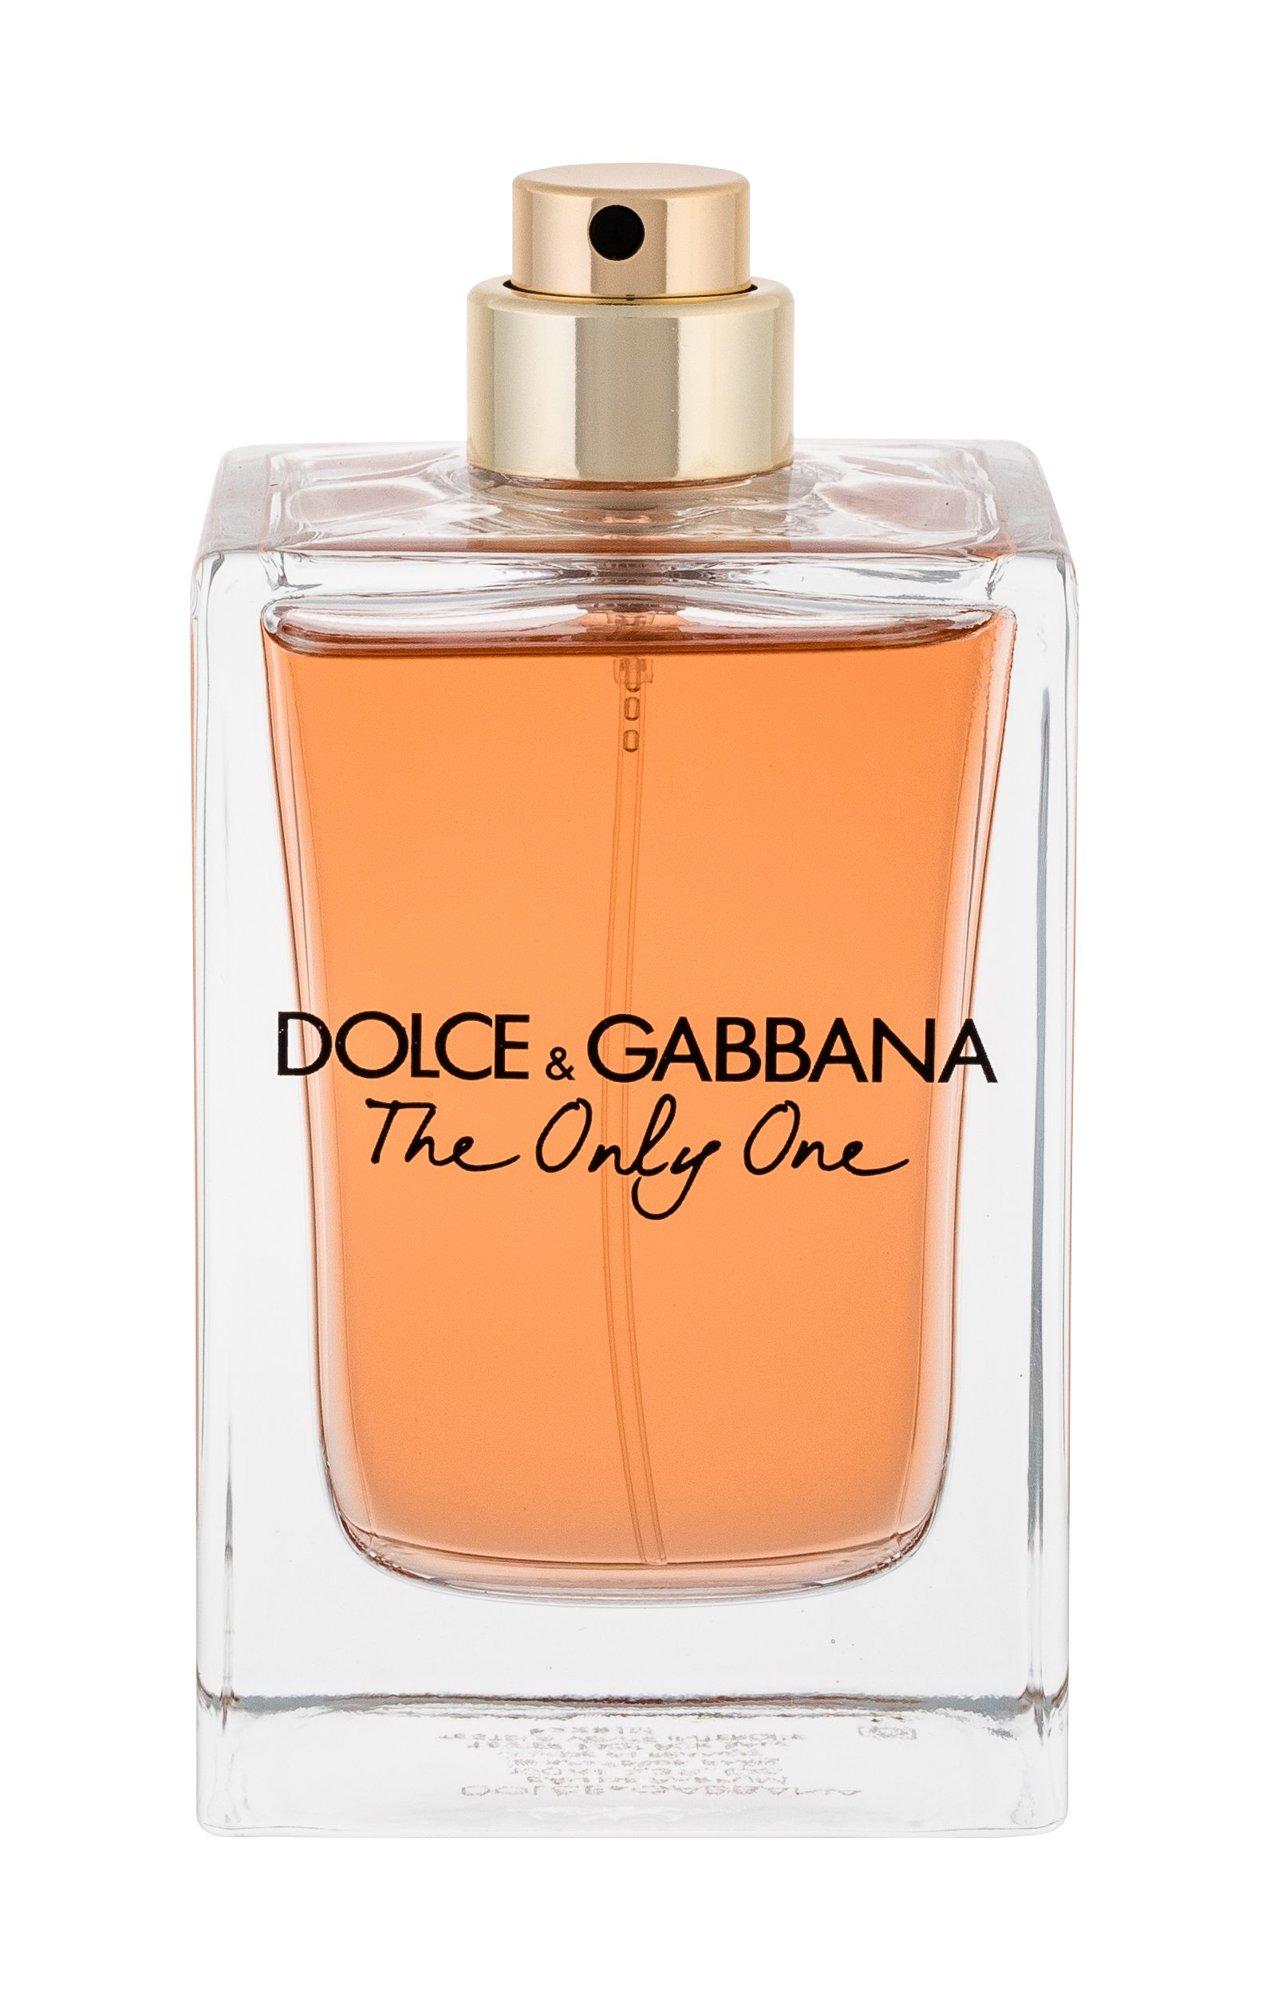 Dolce&Gabbana The Only One Eau de Parfum 100ml